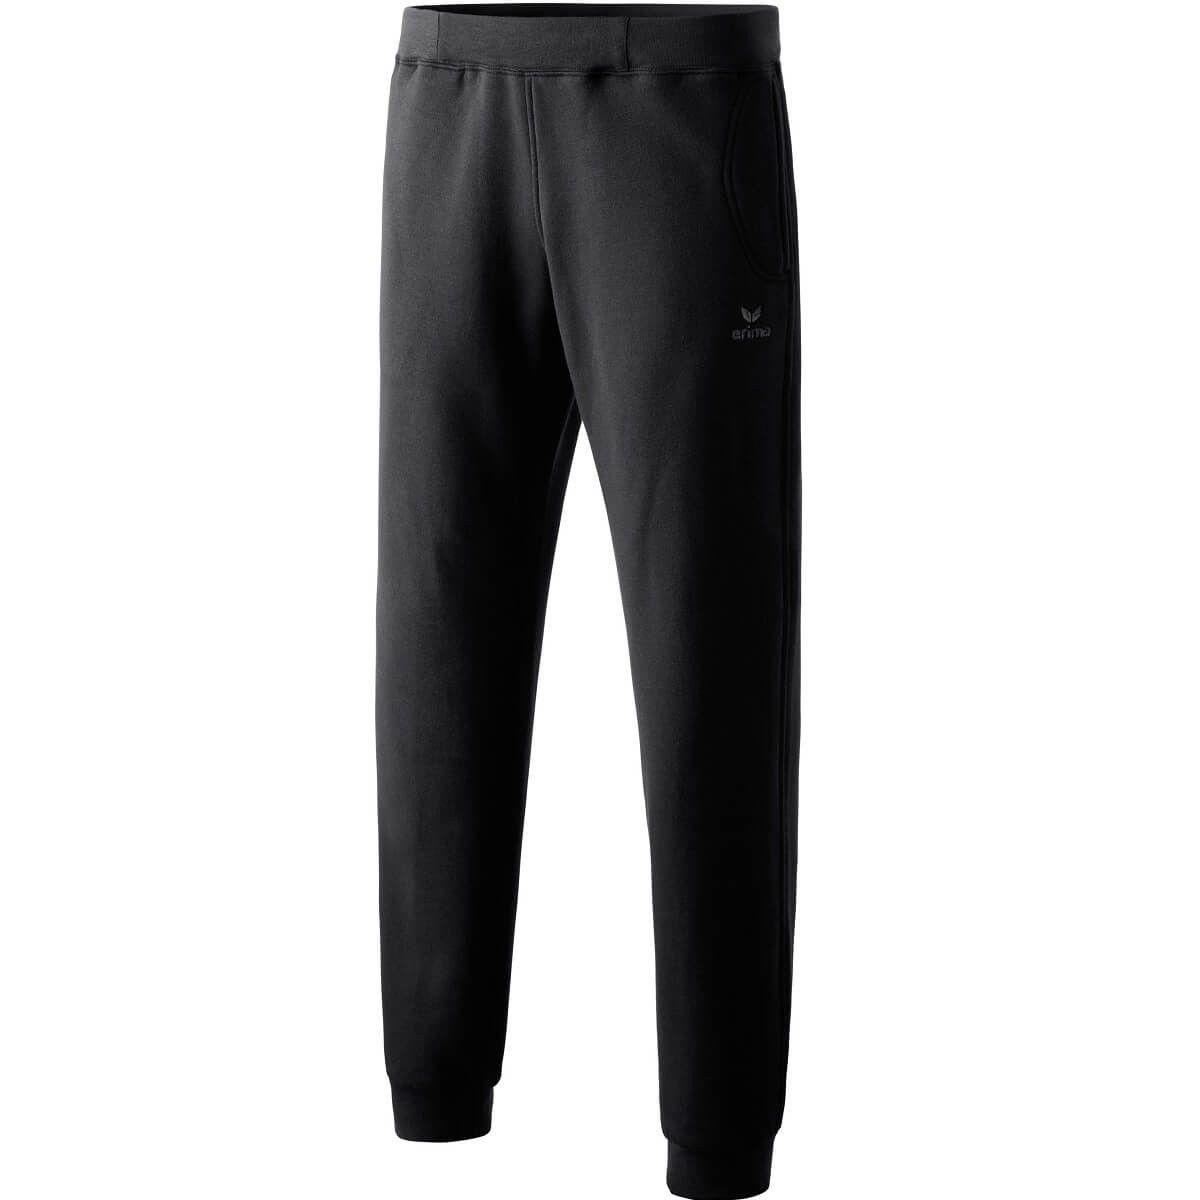 Pantalon sweat avec ceinture